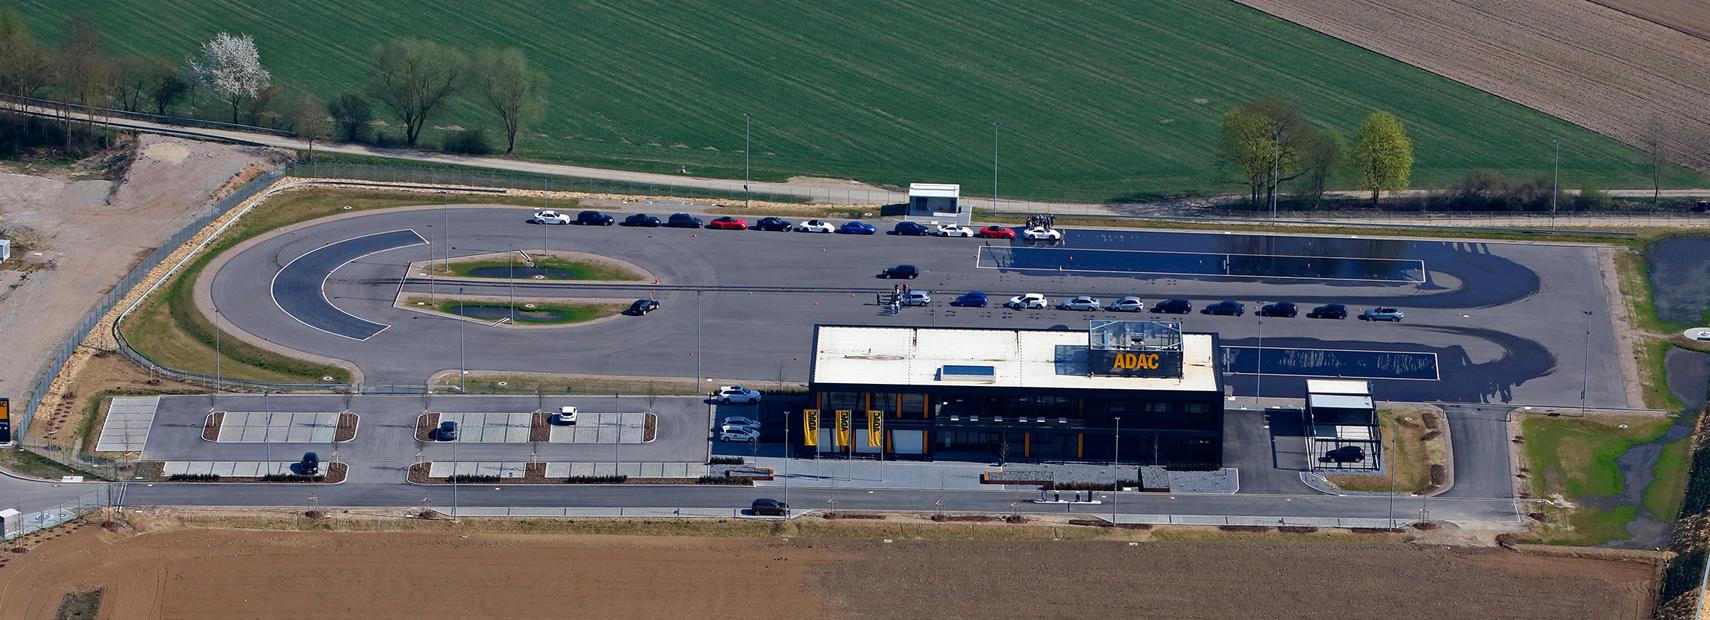 ADAC Fahrsicherheitszentrum Regensburg/Rosenhof